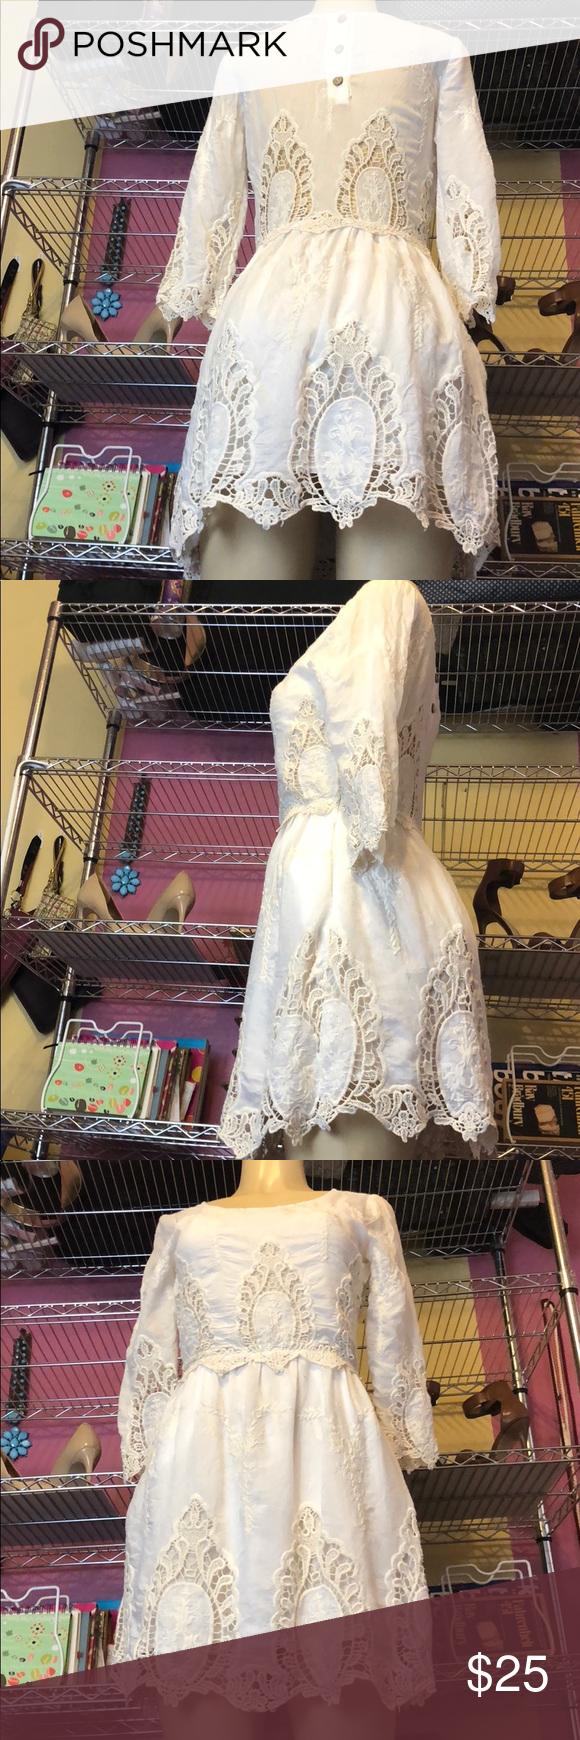 Cream dresses for weddings  Gorgeous Bohemian Cream Dress W beautiful detail in   My Posh